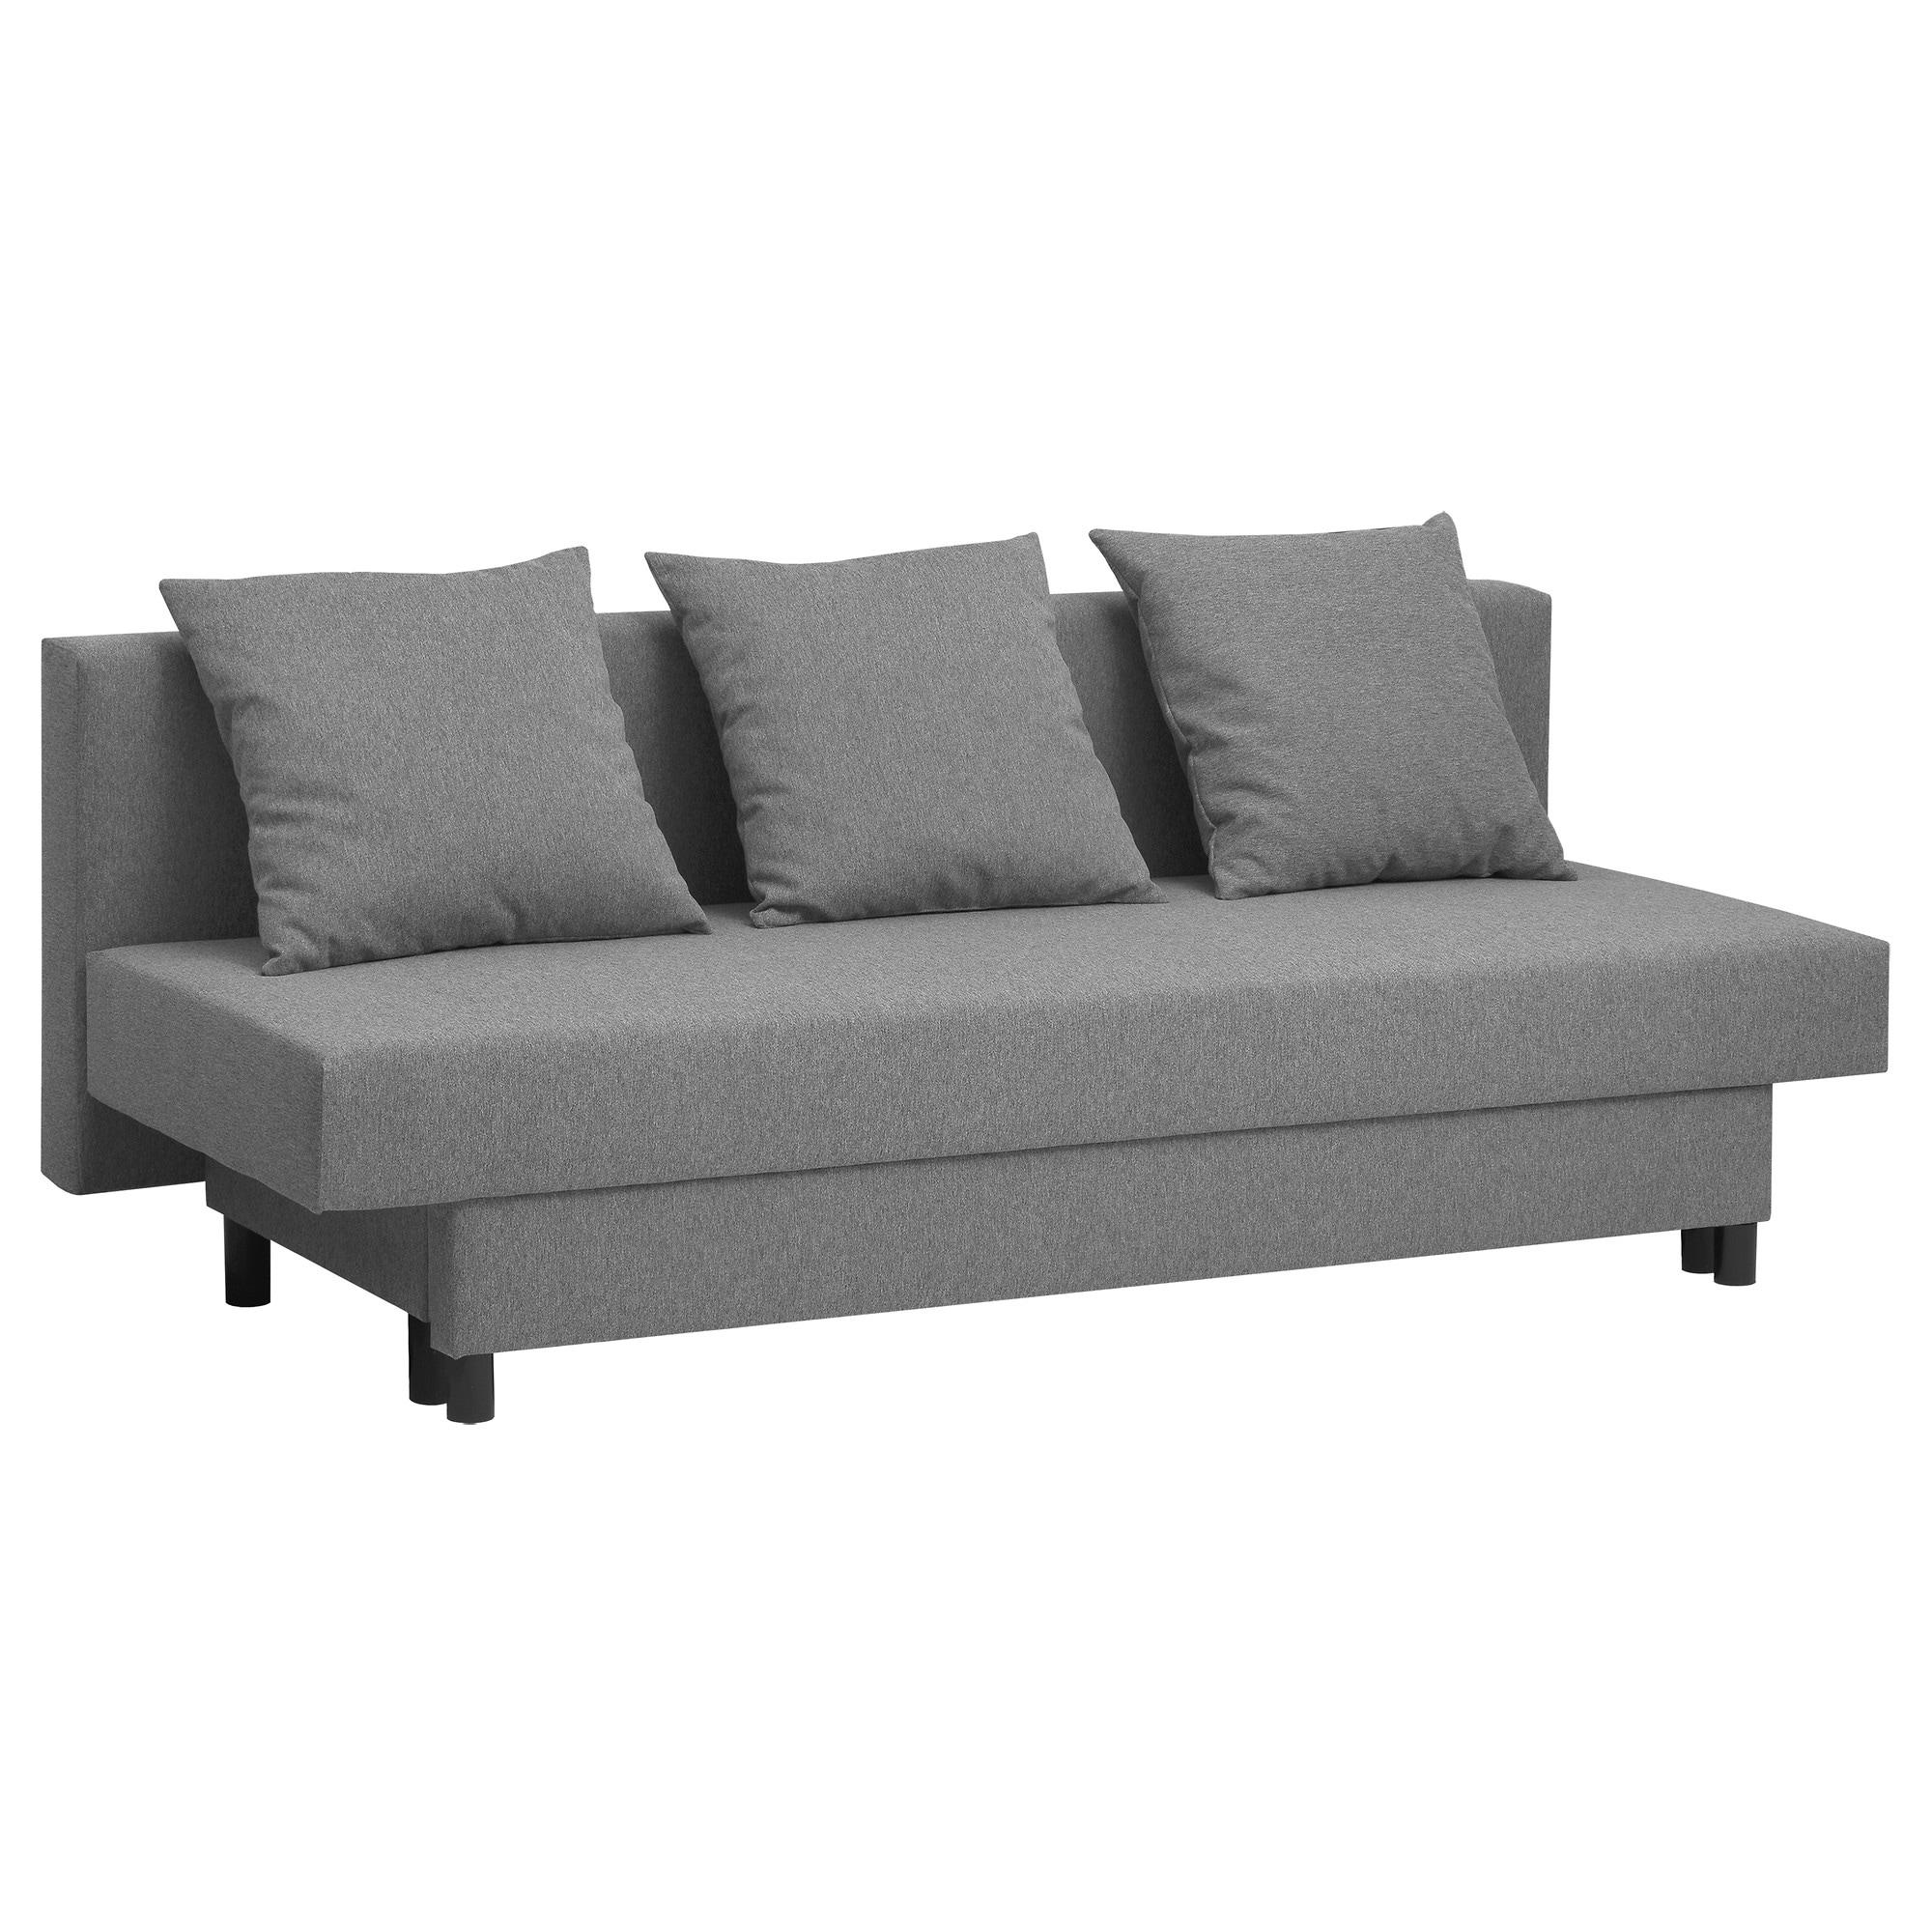 Sofas Ikea Baratos S5d8 sofà S Y Sillones Pra Online Ikea